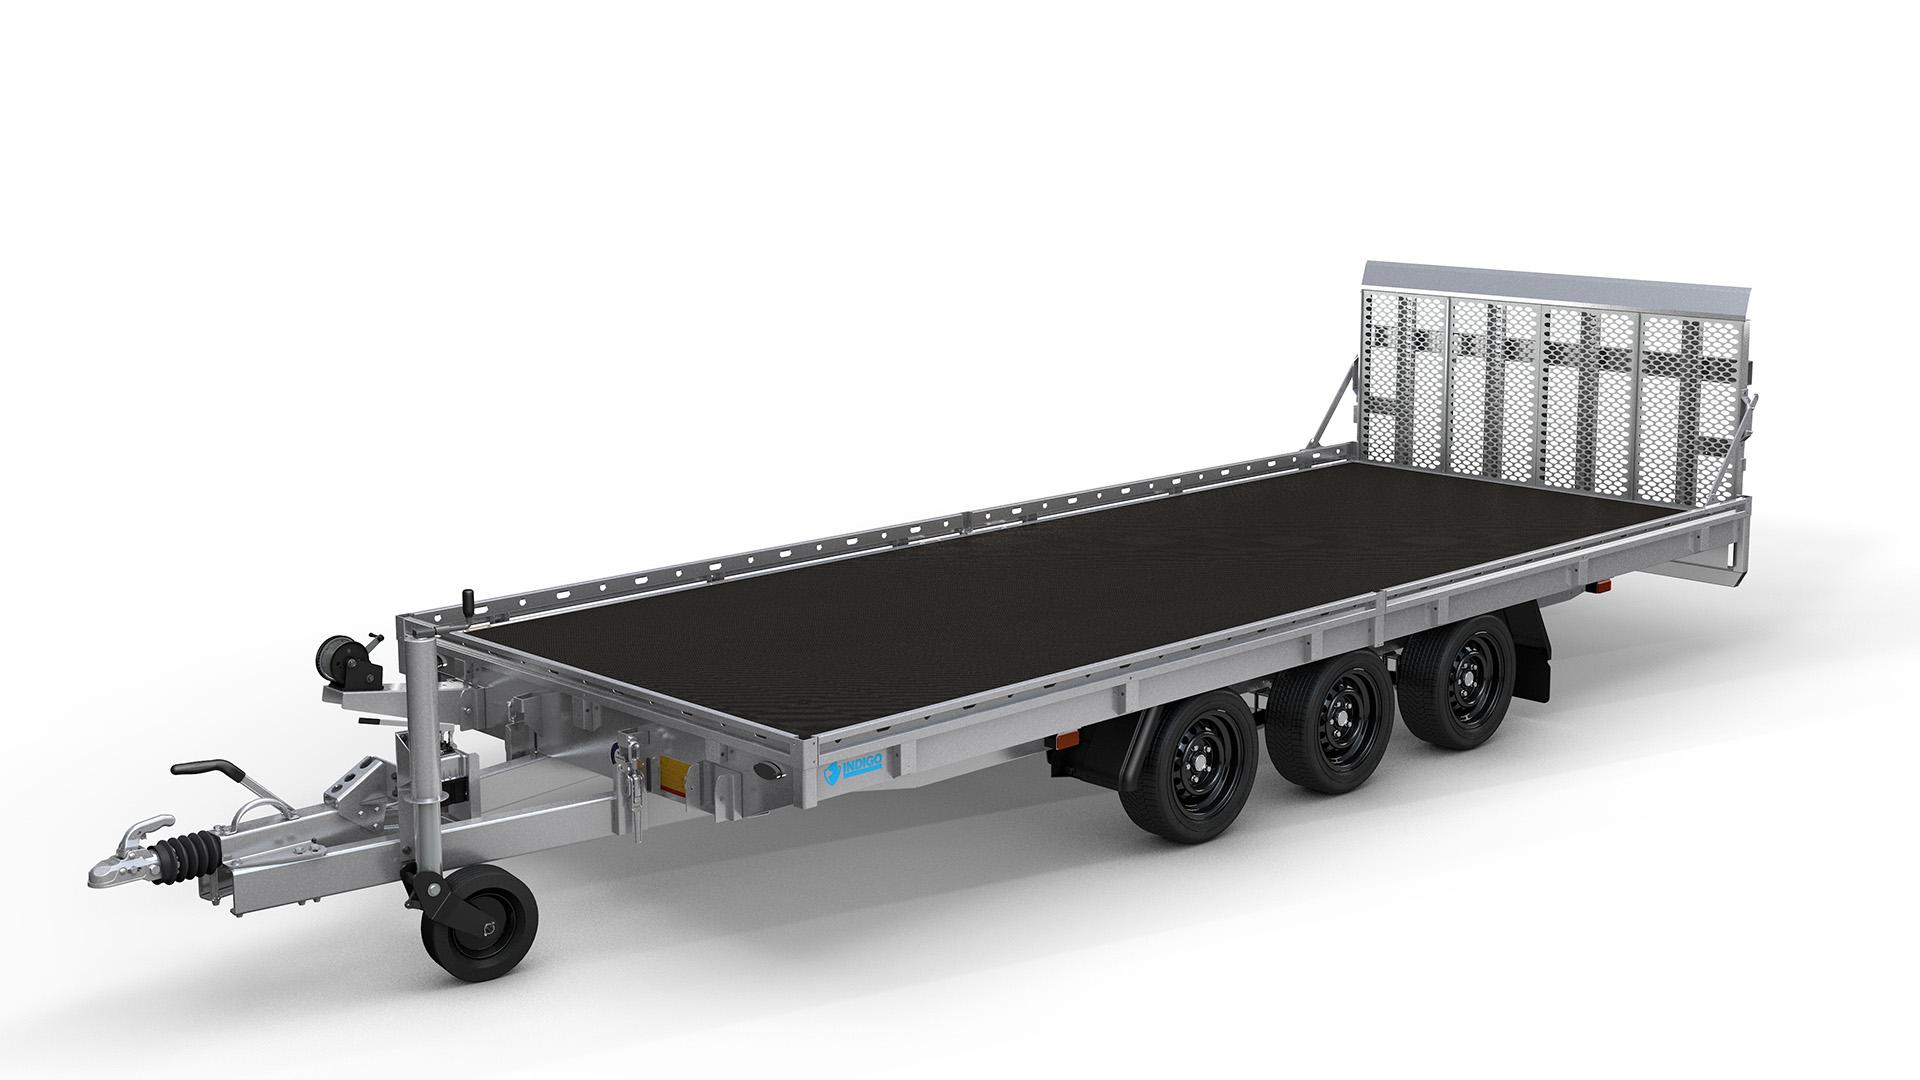 Indigo HT-3 Transporter